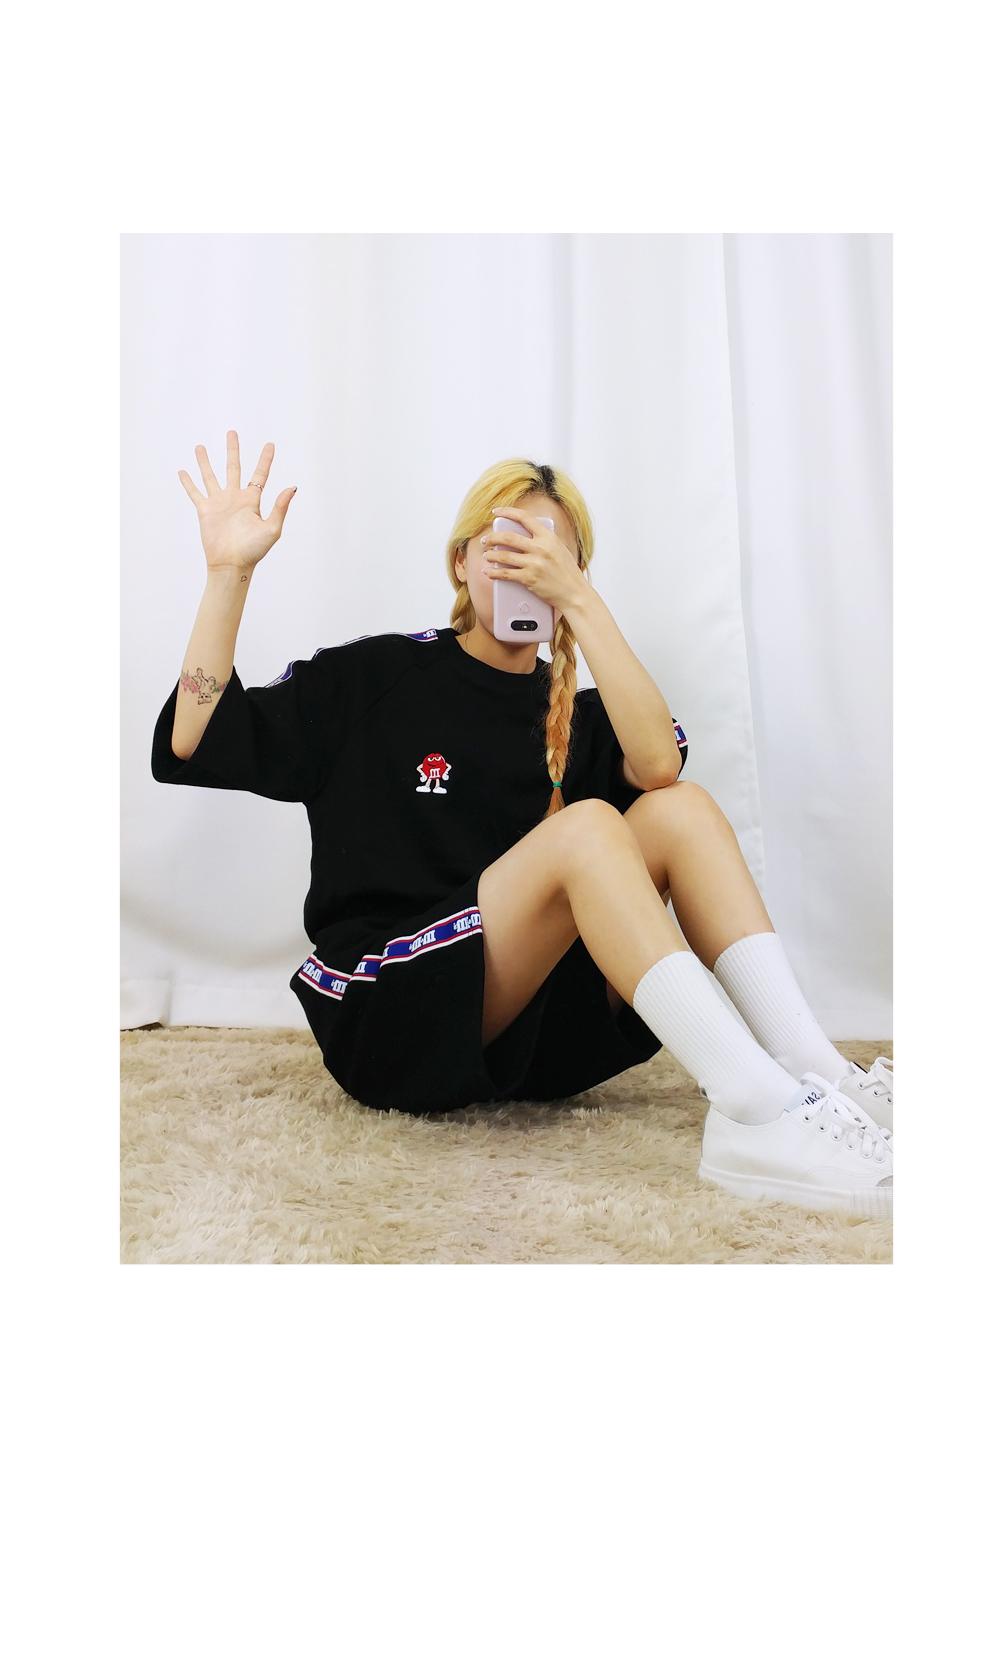 M & M M & M round short sleeve SET ♥ unisex ♥